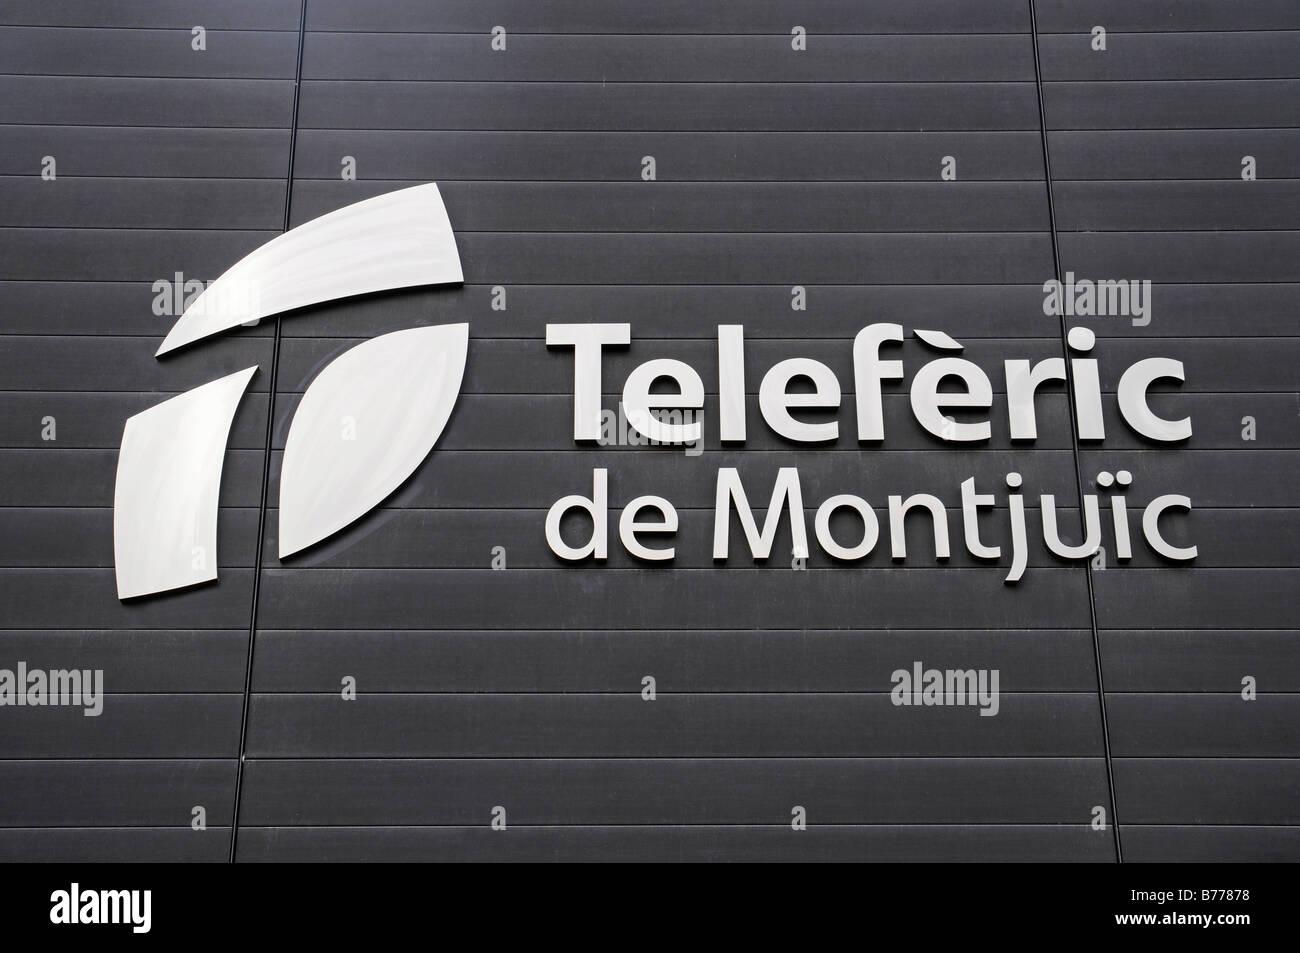 Teleferic, cable car logo, Montjuic, Barcelona, Catalonia, Spain, Europe - Stock Image